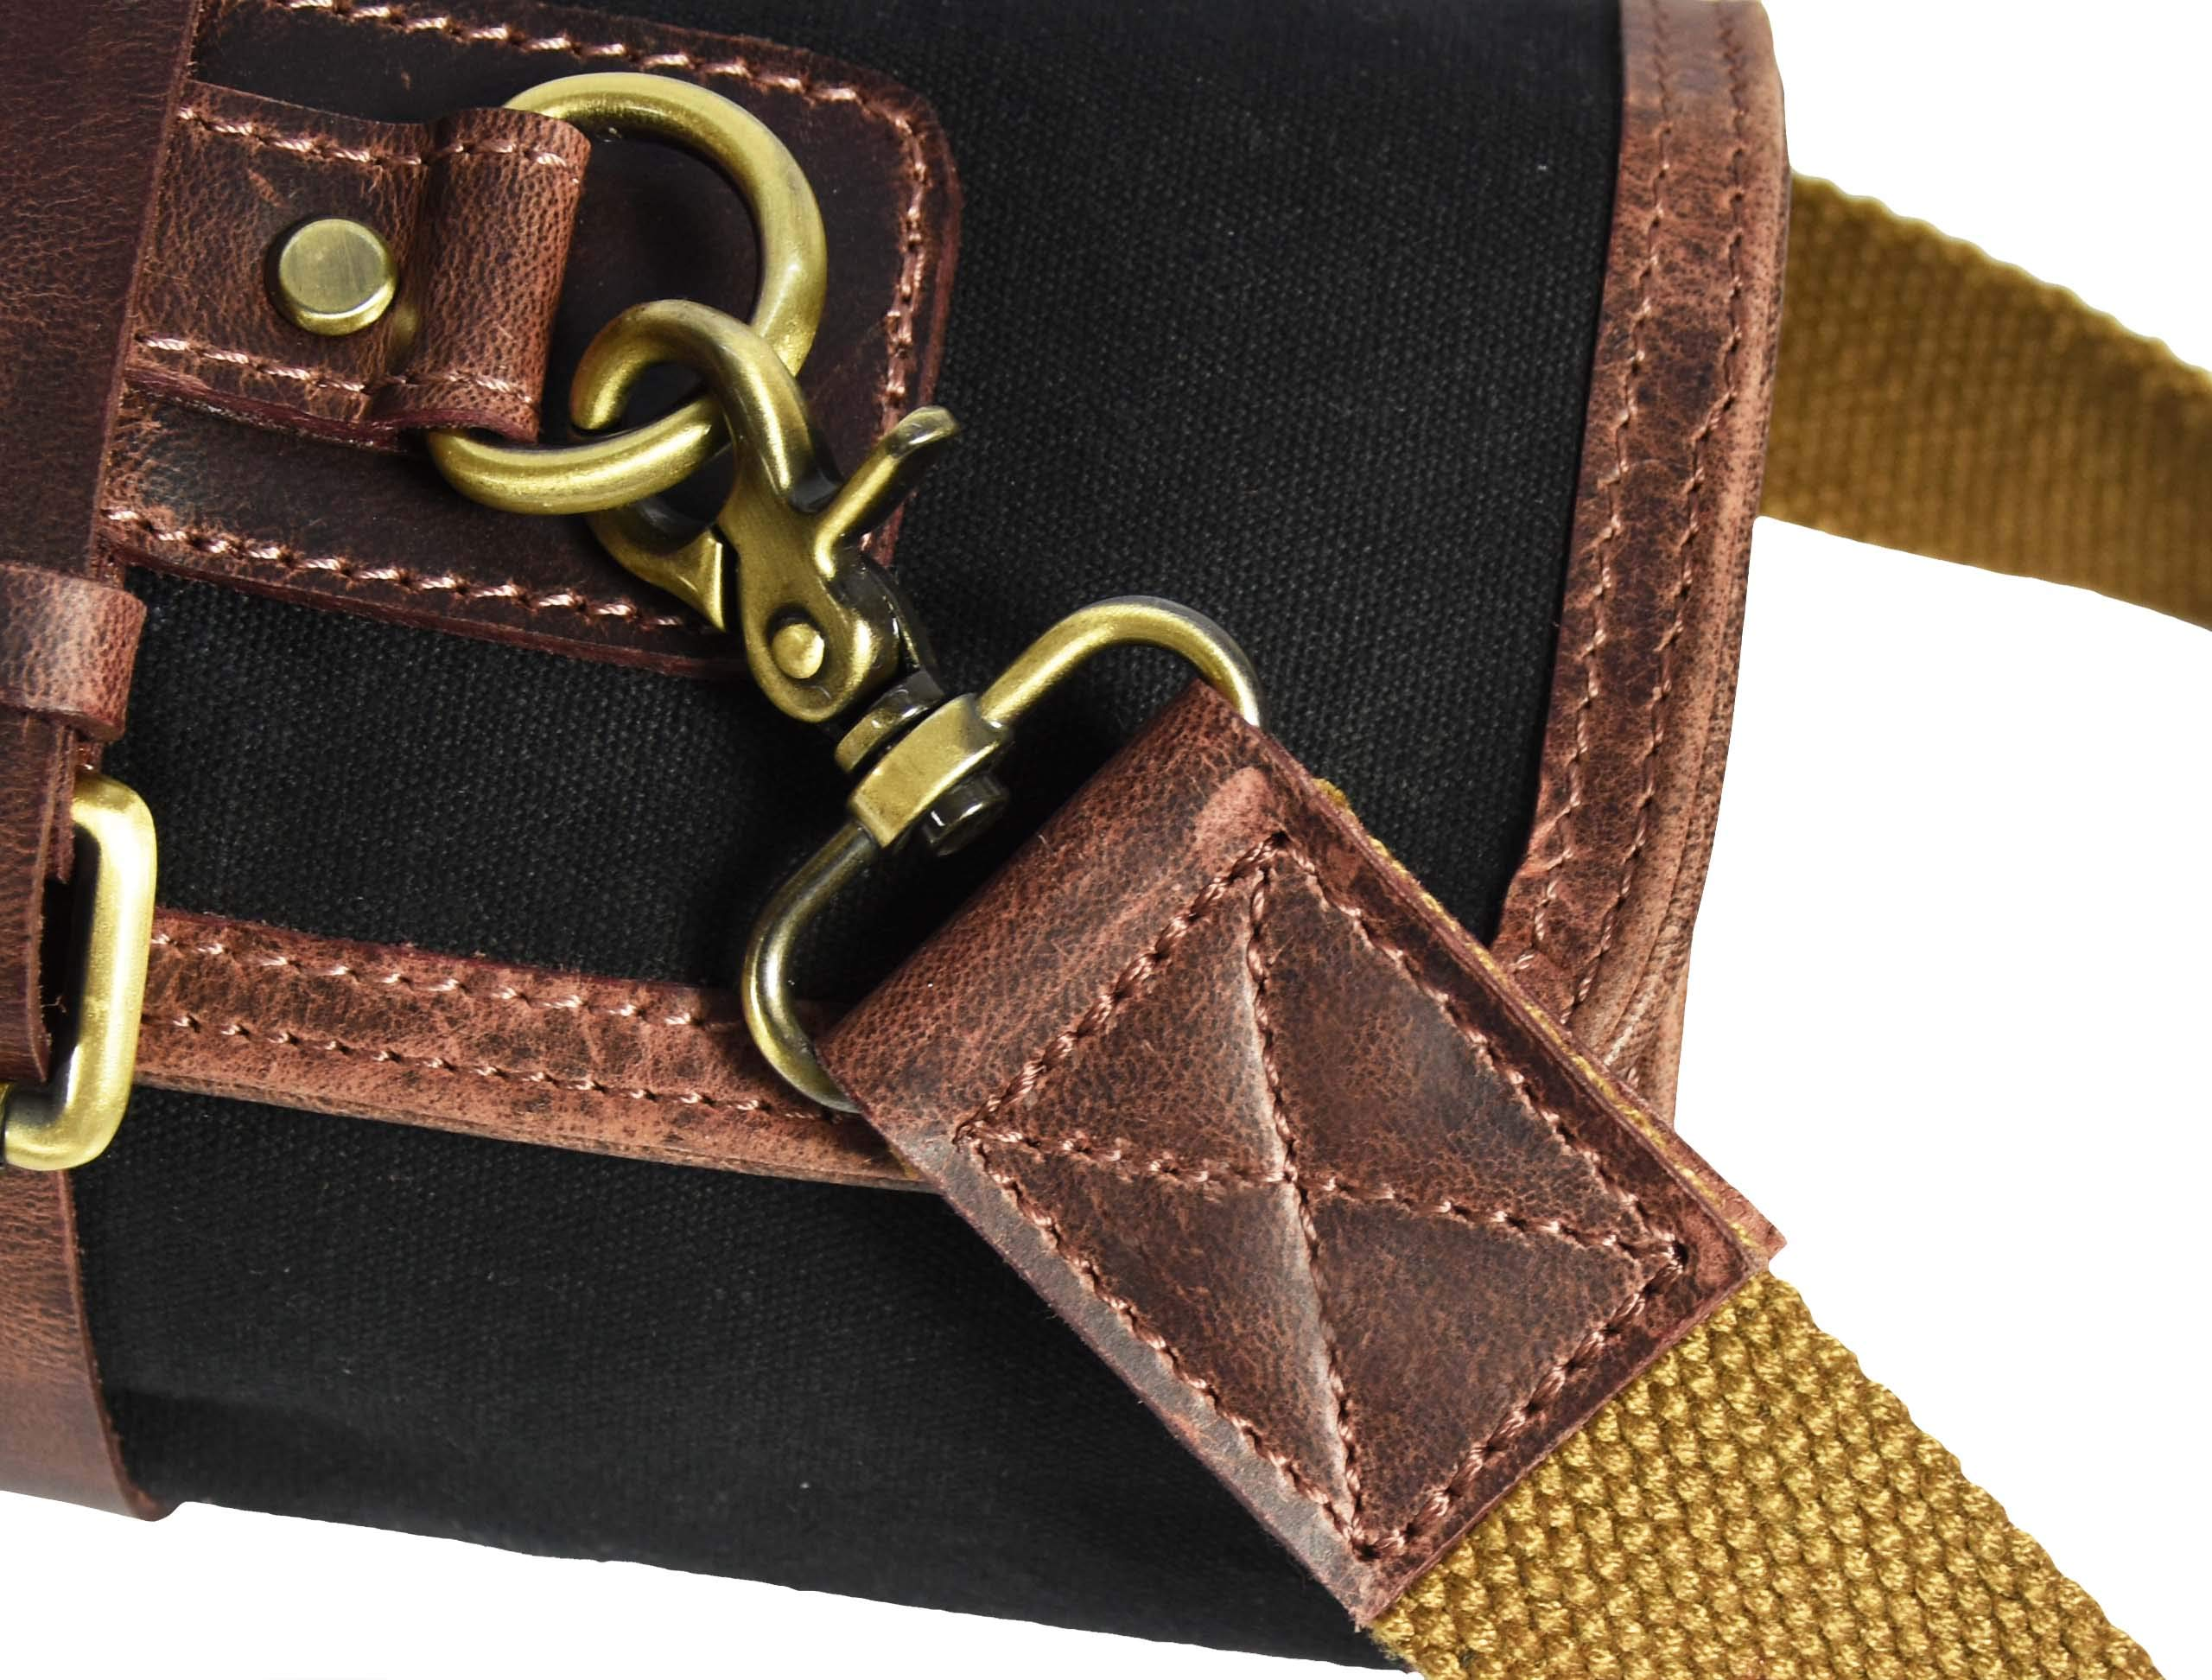 Leather Knife Roll Storage Bag   Elastic and Expandable 10 Pockets   Adjustable/Detachable Shoulder Strap   Travel-Friendly Chef Knife Case Roll By Aaron Leather (Raven, Canvas) by AARON LEATHER GOODS VENDIMIA ESTILO (Image #6)